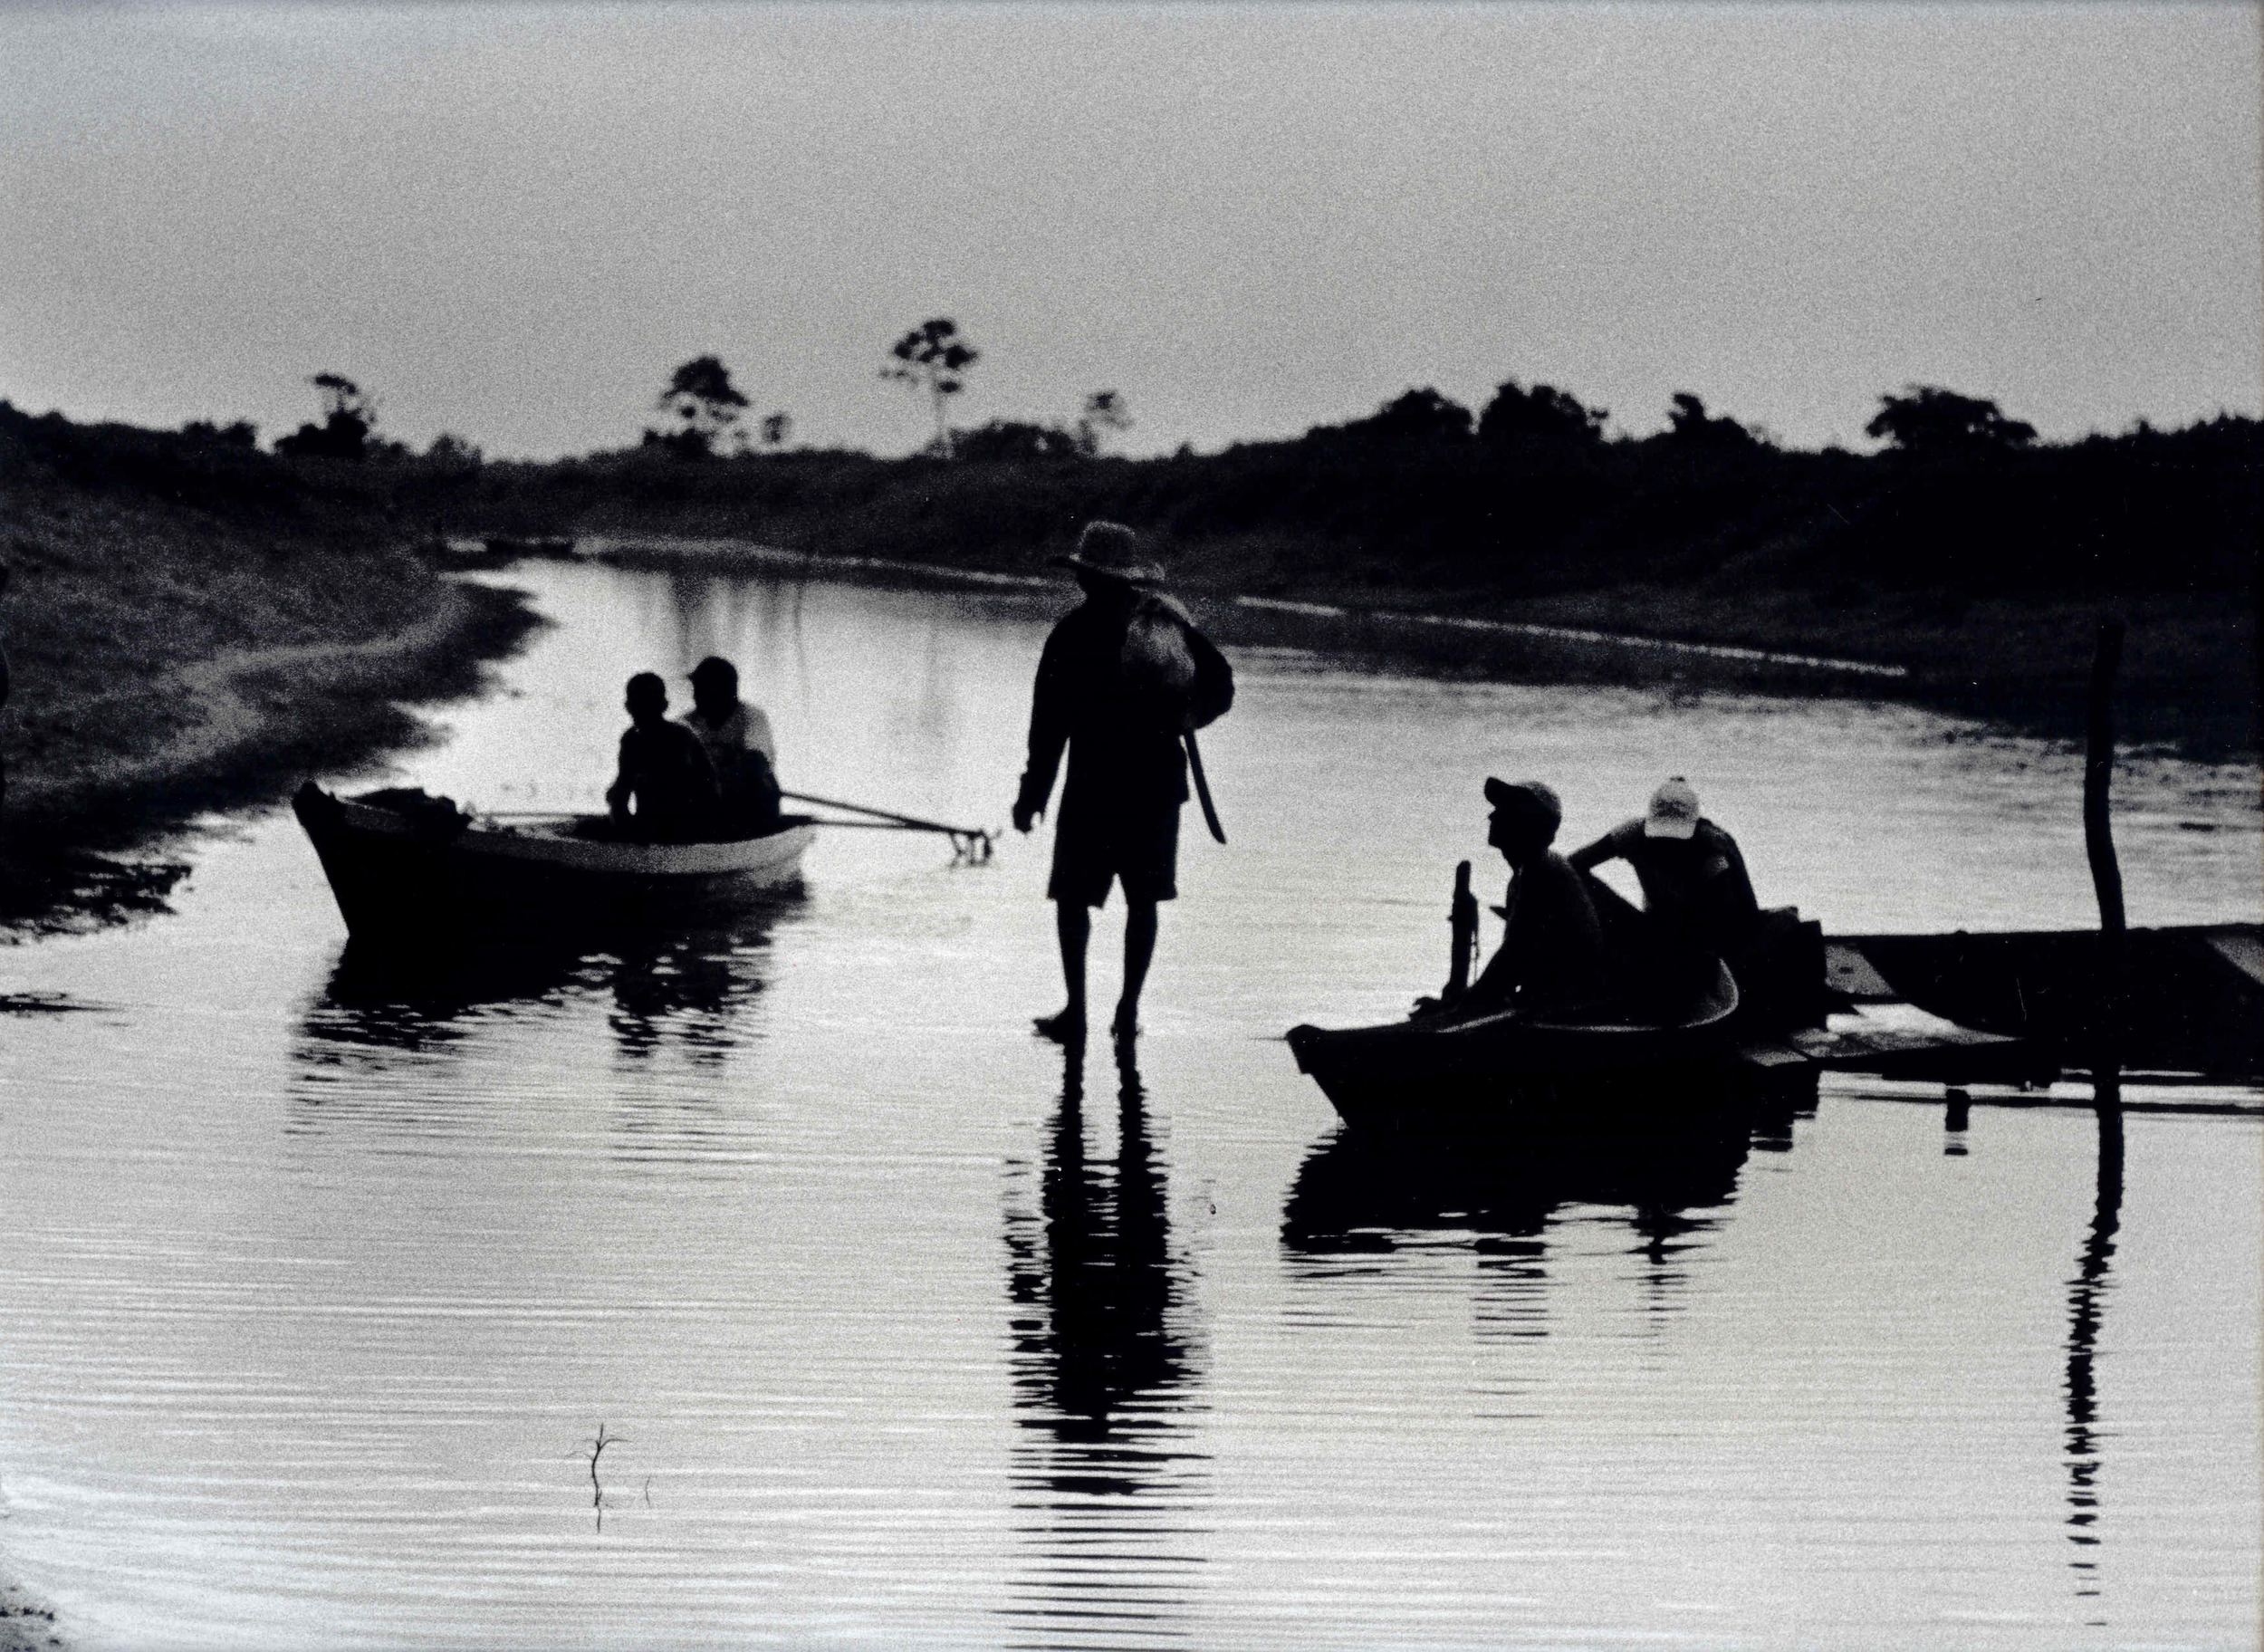 Lower Amazon floodplain lakes managed under the community co-management system are 60% more productive than unmanaged lakes. Photo: David McGrath